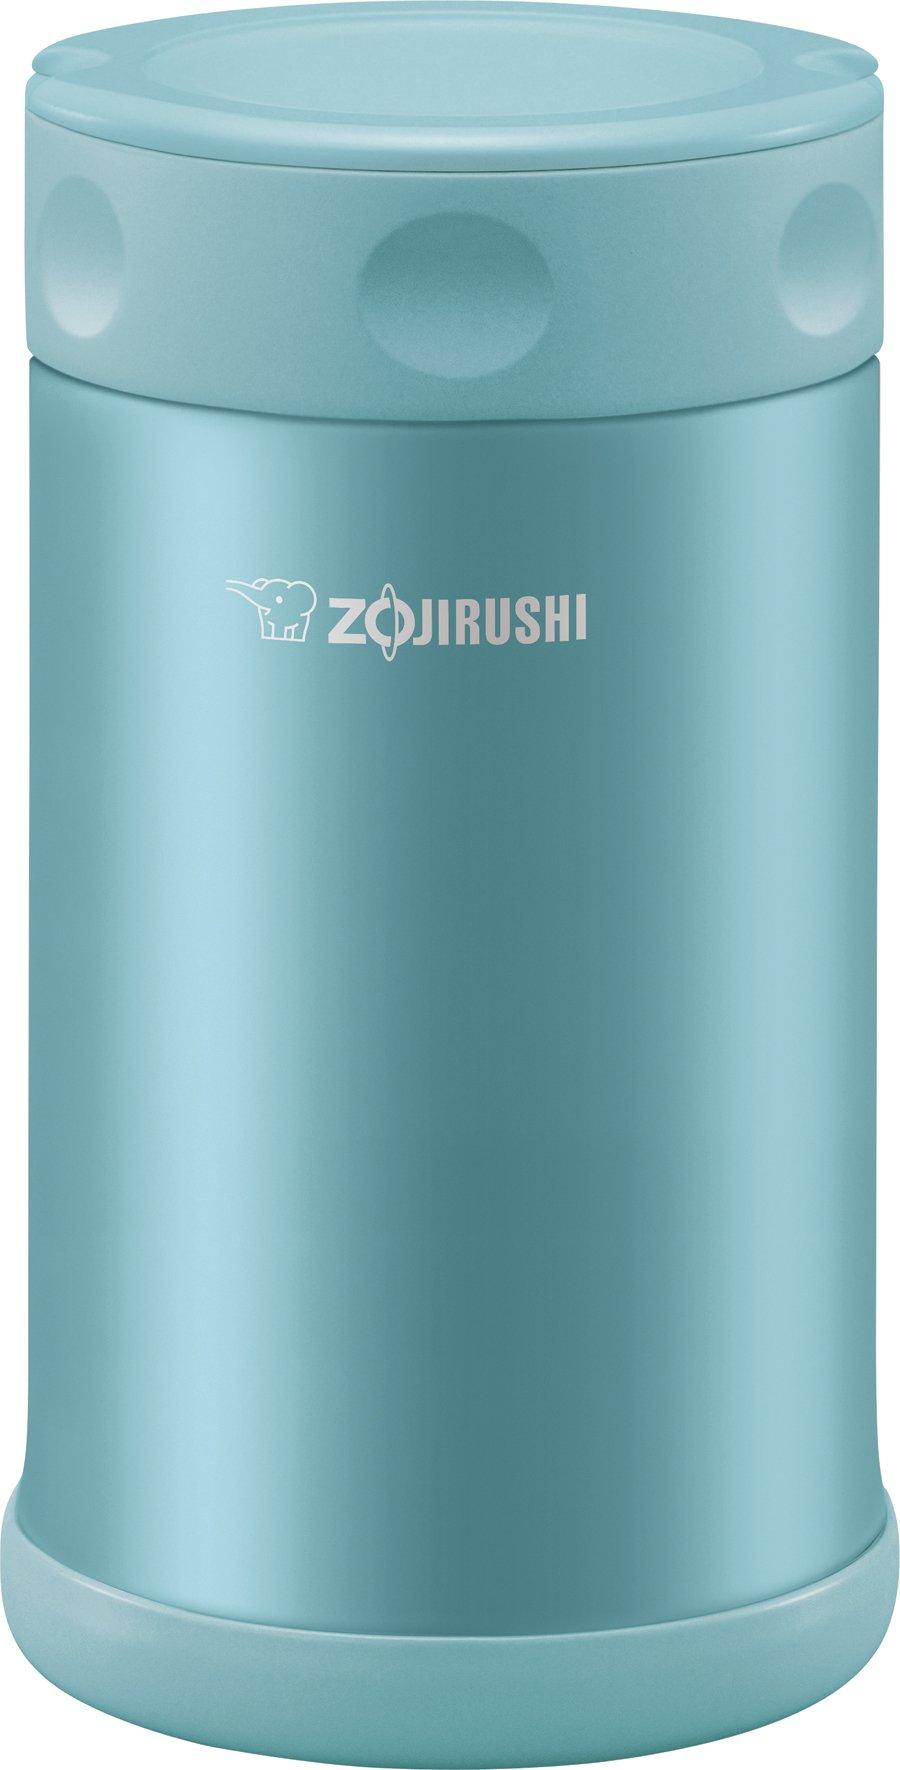 Zojirushi Stainless Steel Food Jar 25 oz./0.75 Liter, Aqua Blue